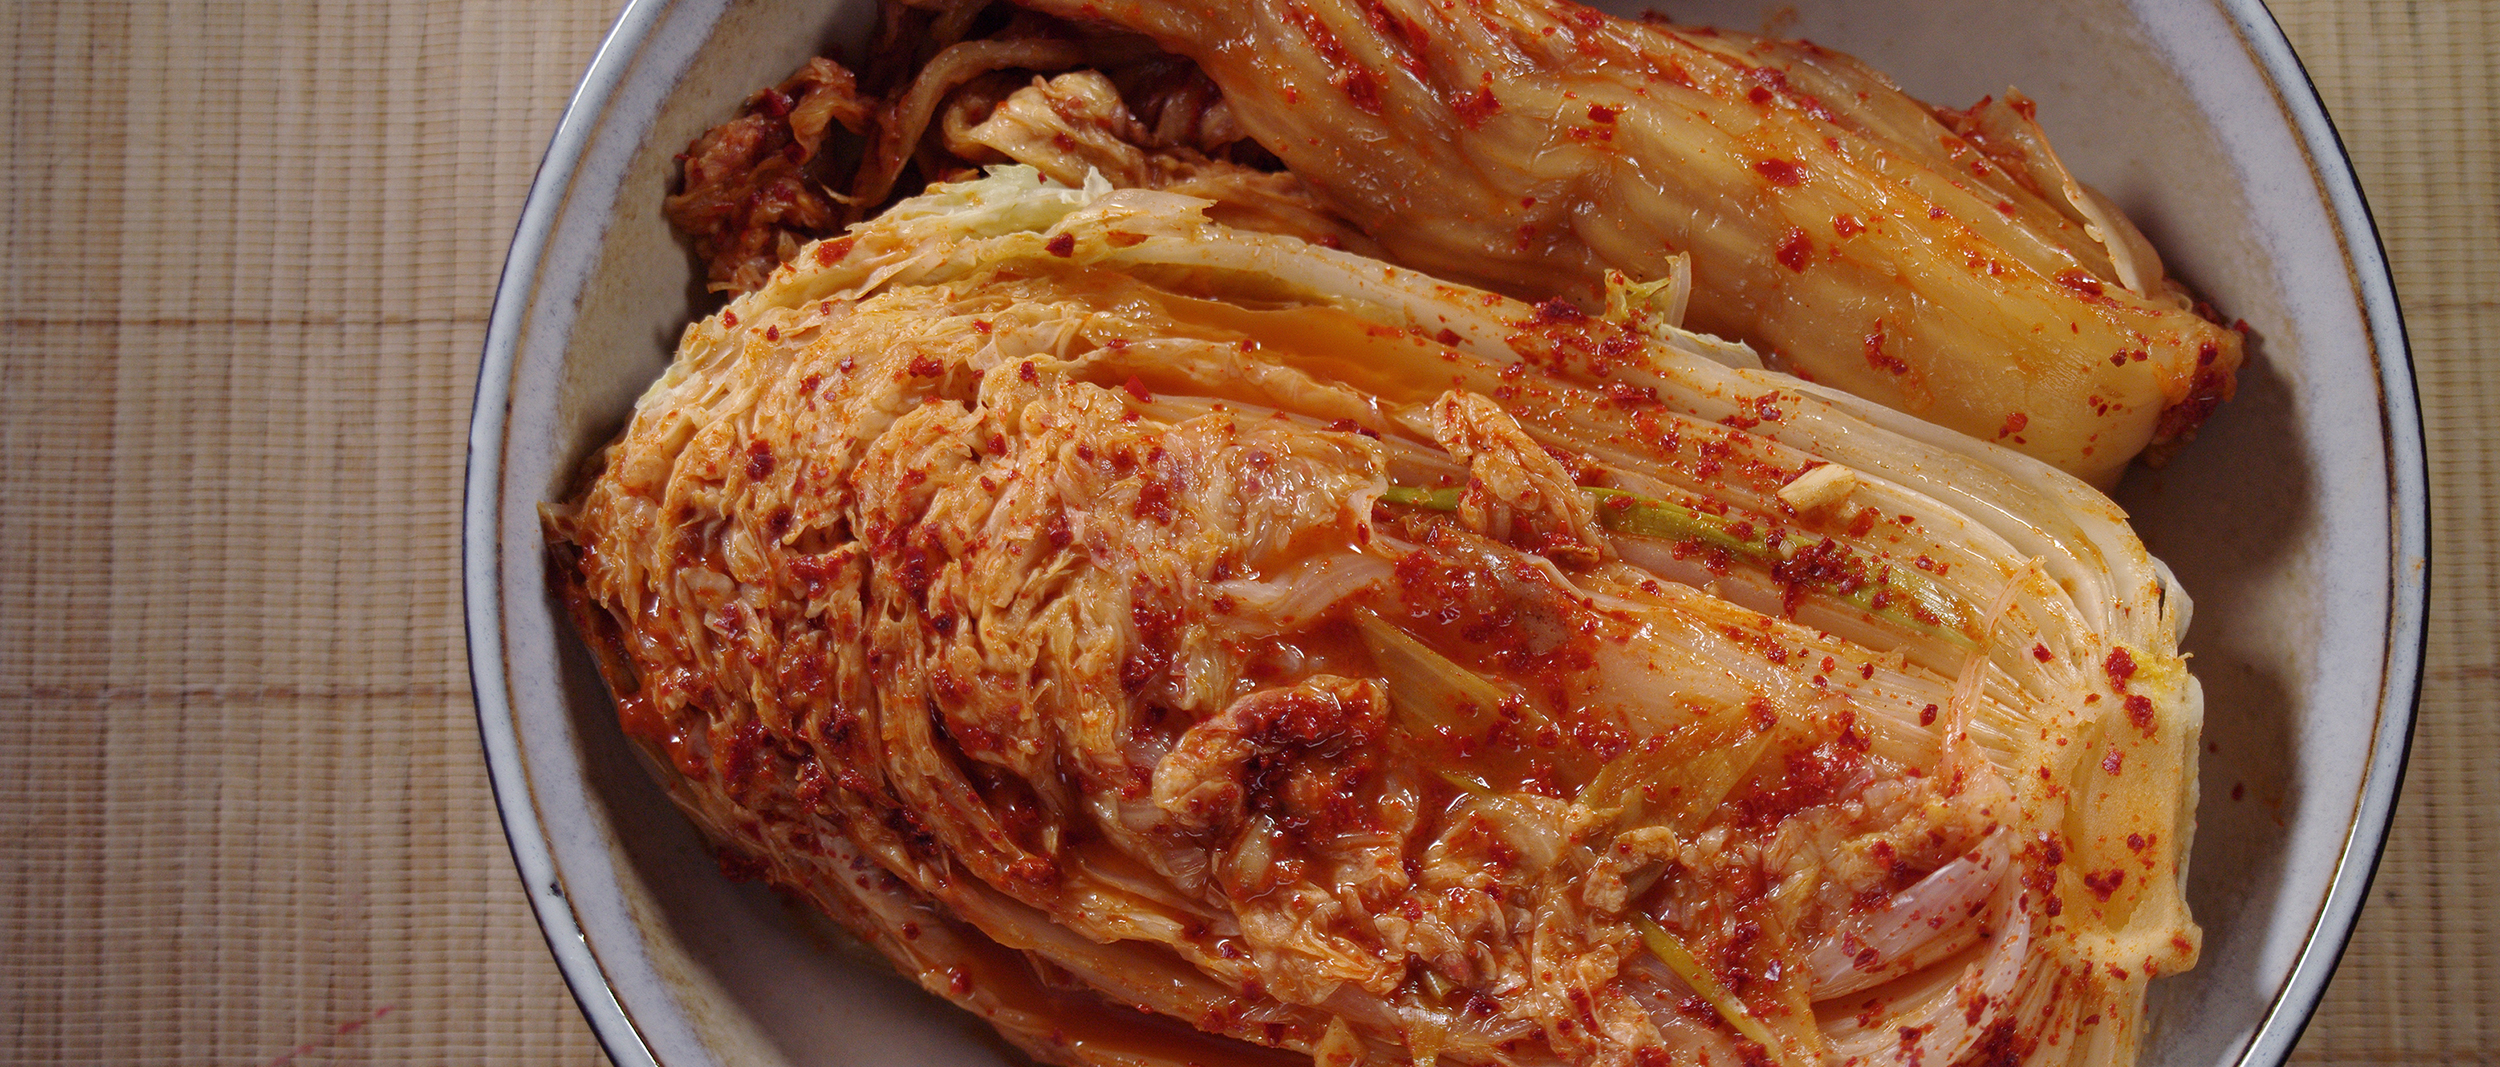 kchi-kimchi-intense-100dpi-06